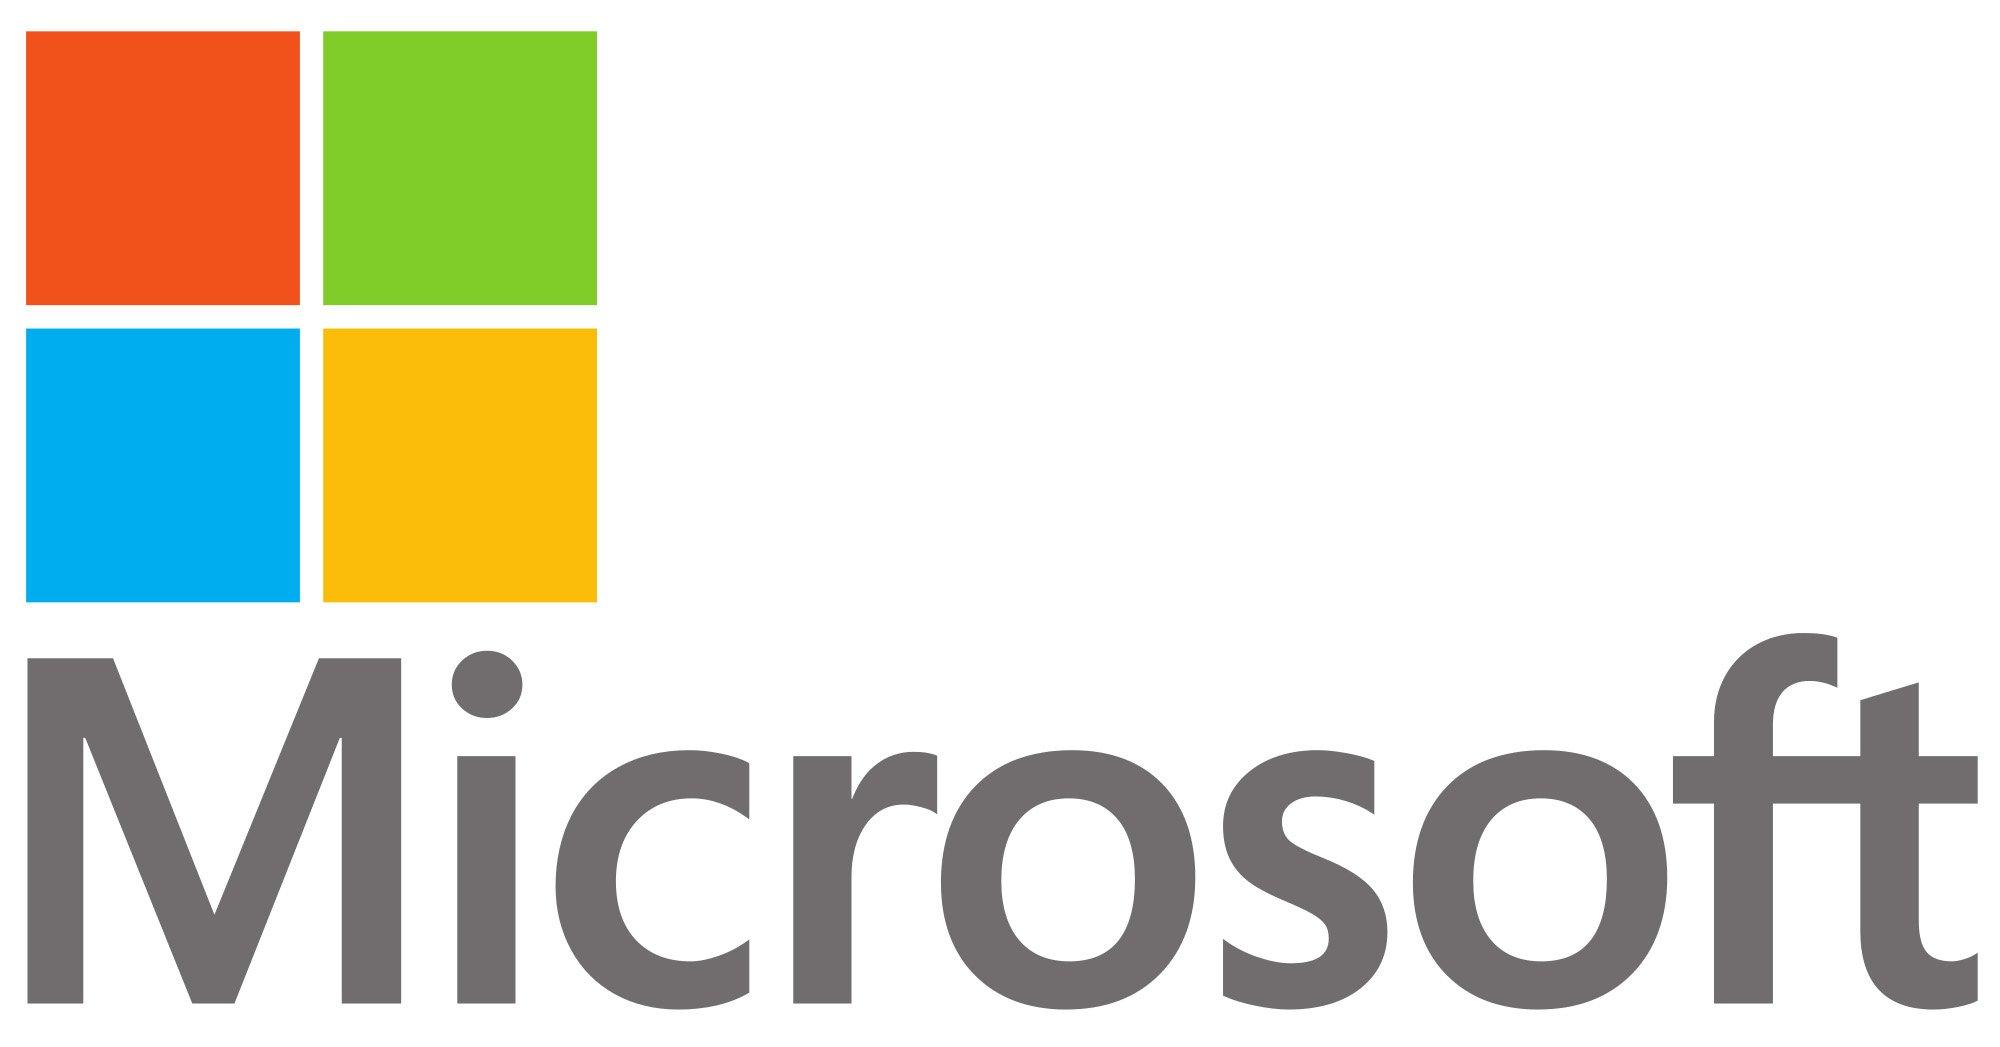 microsoft logo microsoft symbol meaning history and evolution